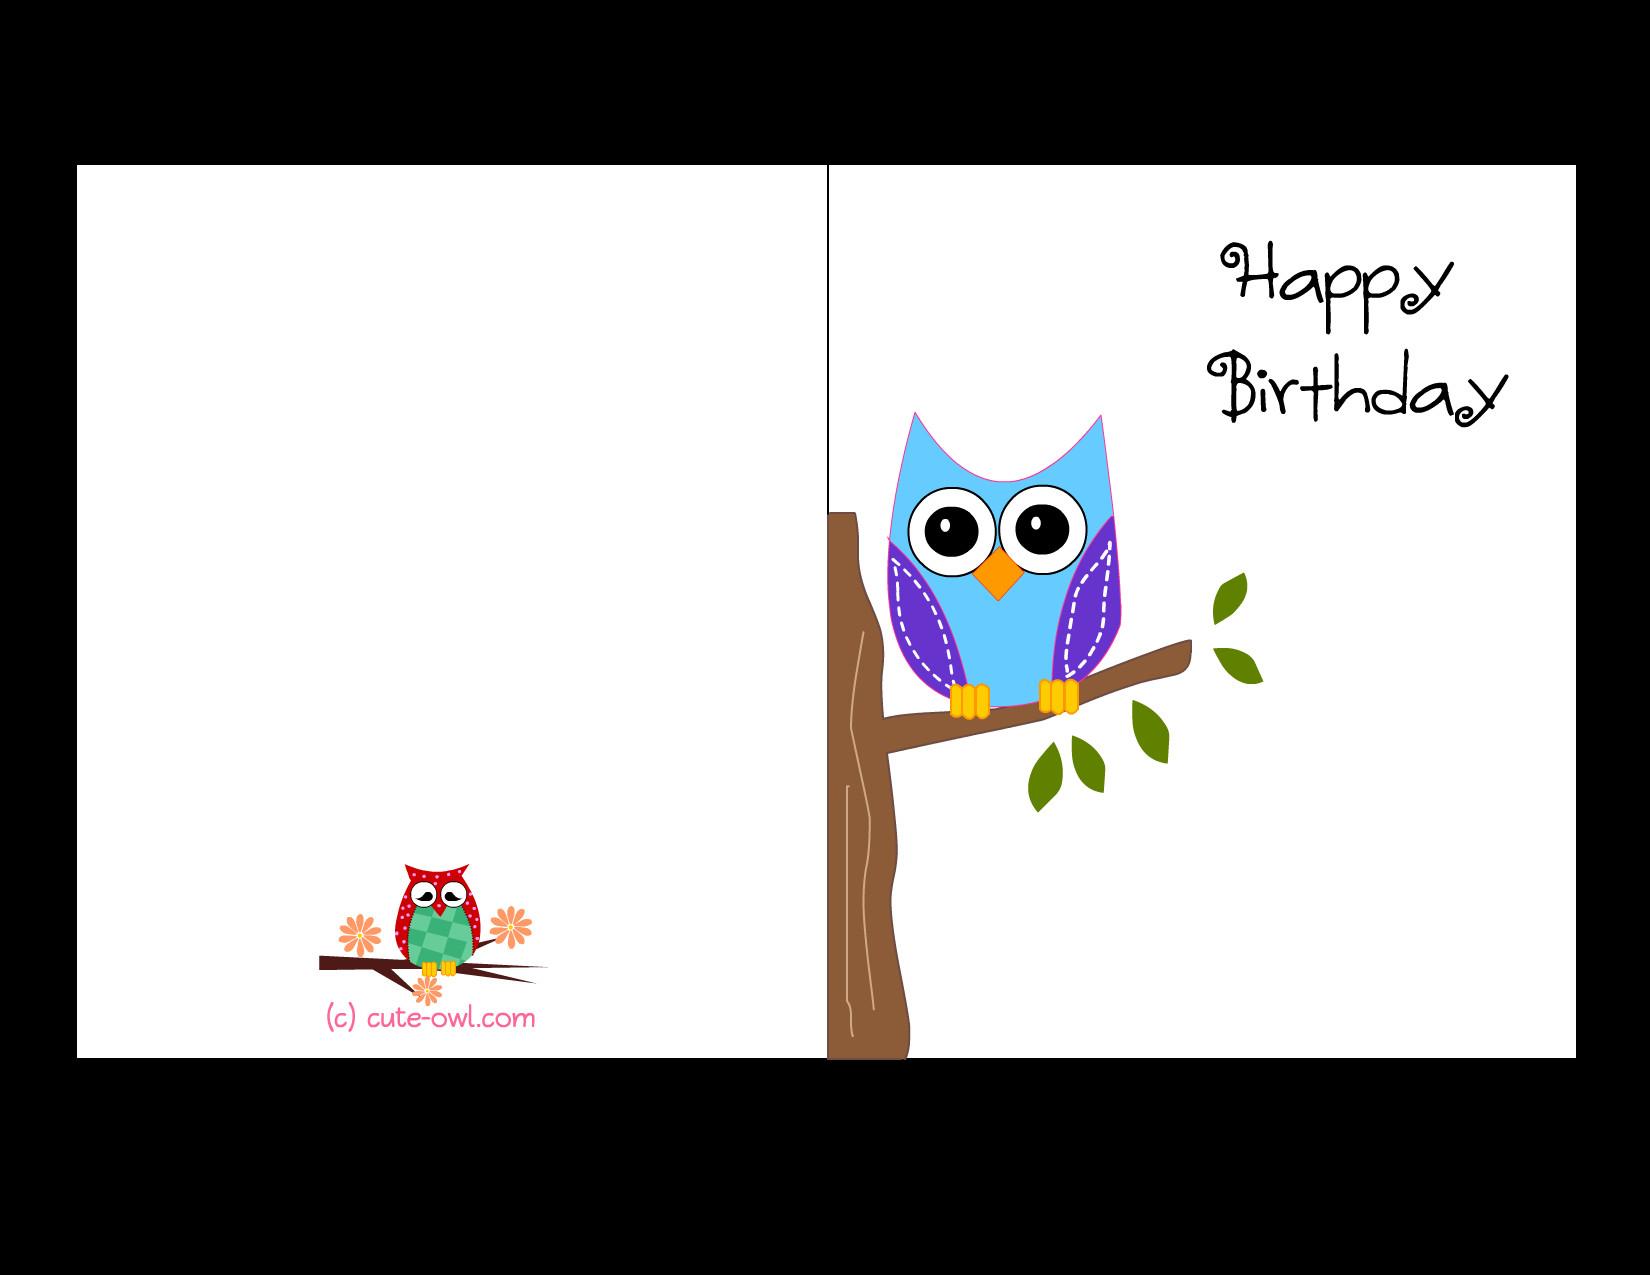 Printable Birthday Card Template  Free Printable Cute Owl Birthday Cards